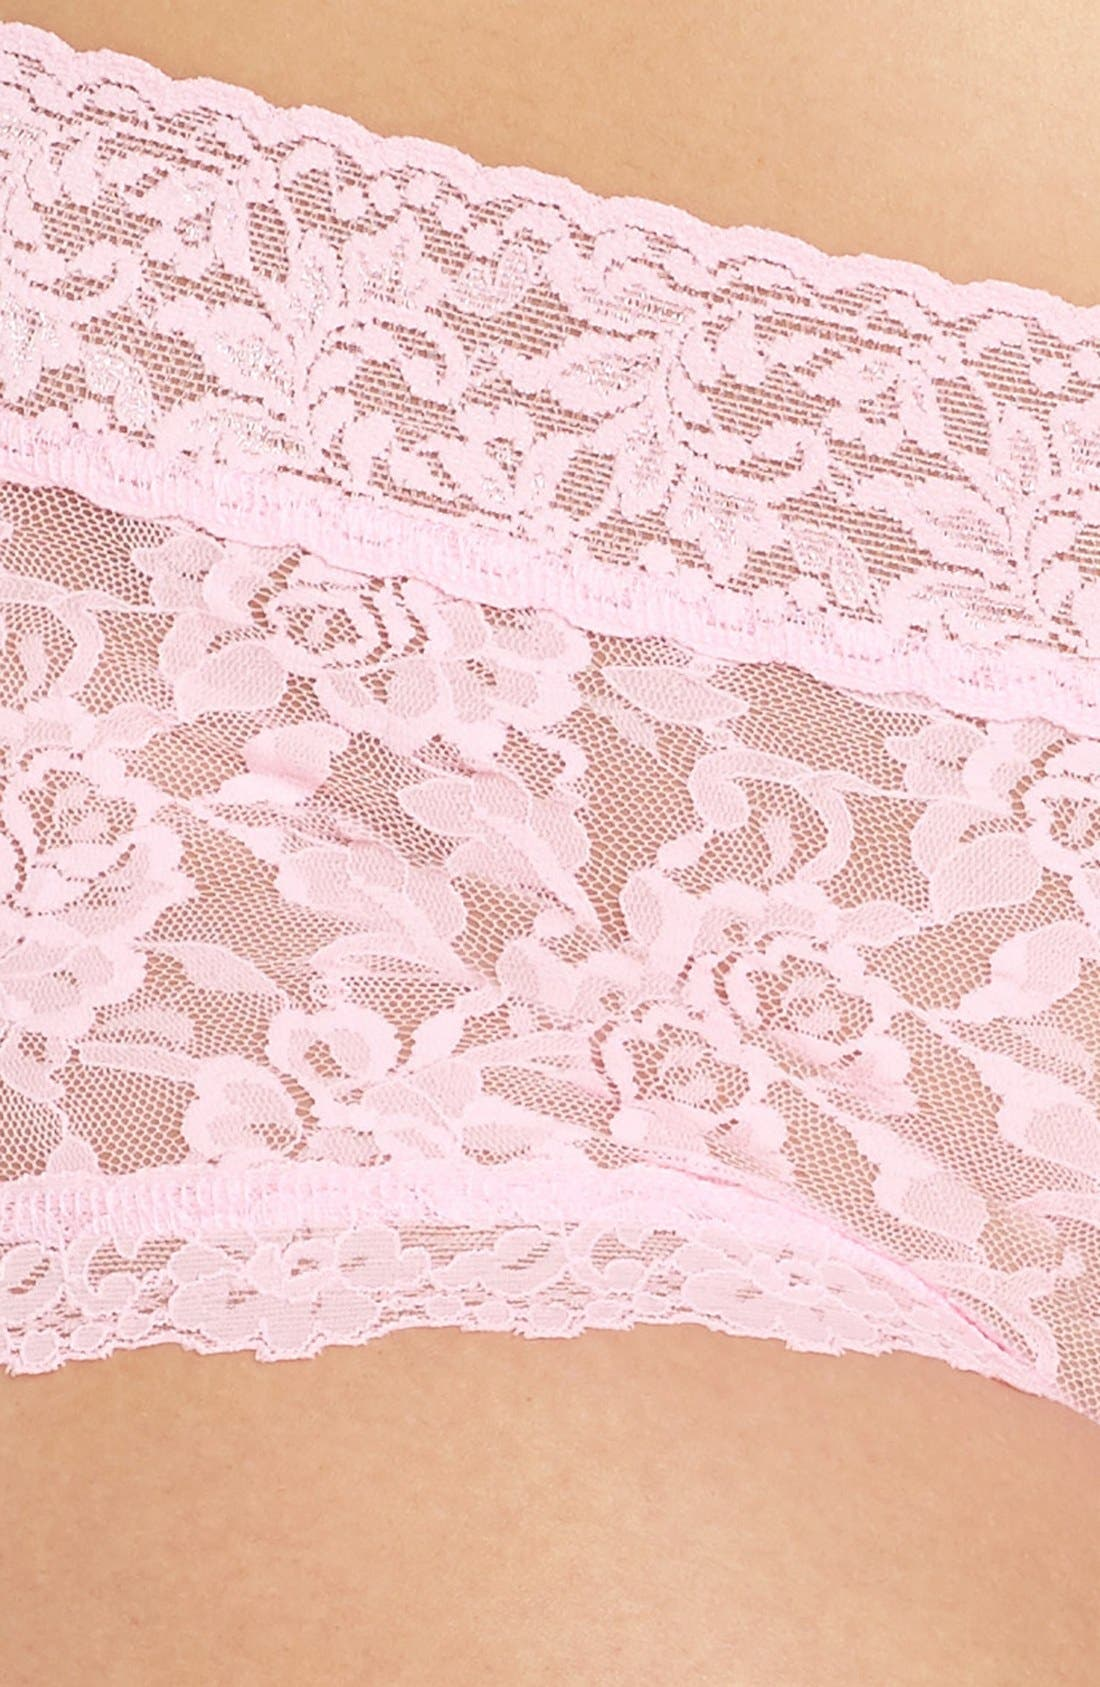 Stretch Lace Boyshorts,                             Alternate thumbnail 133, color,